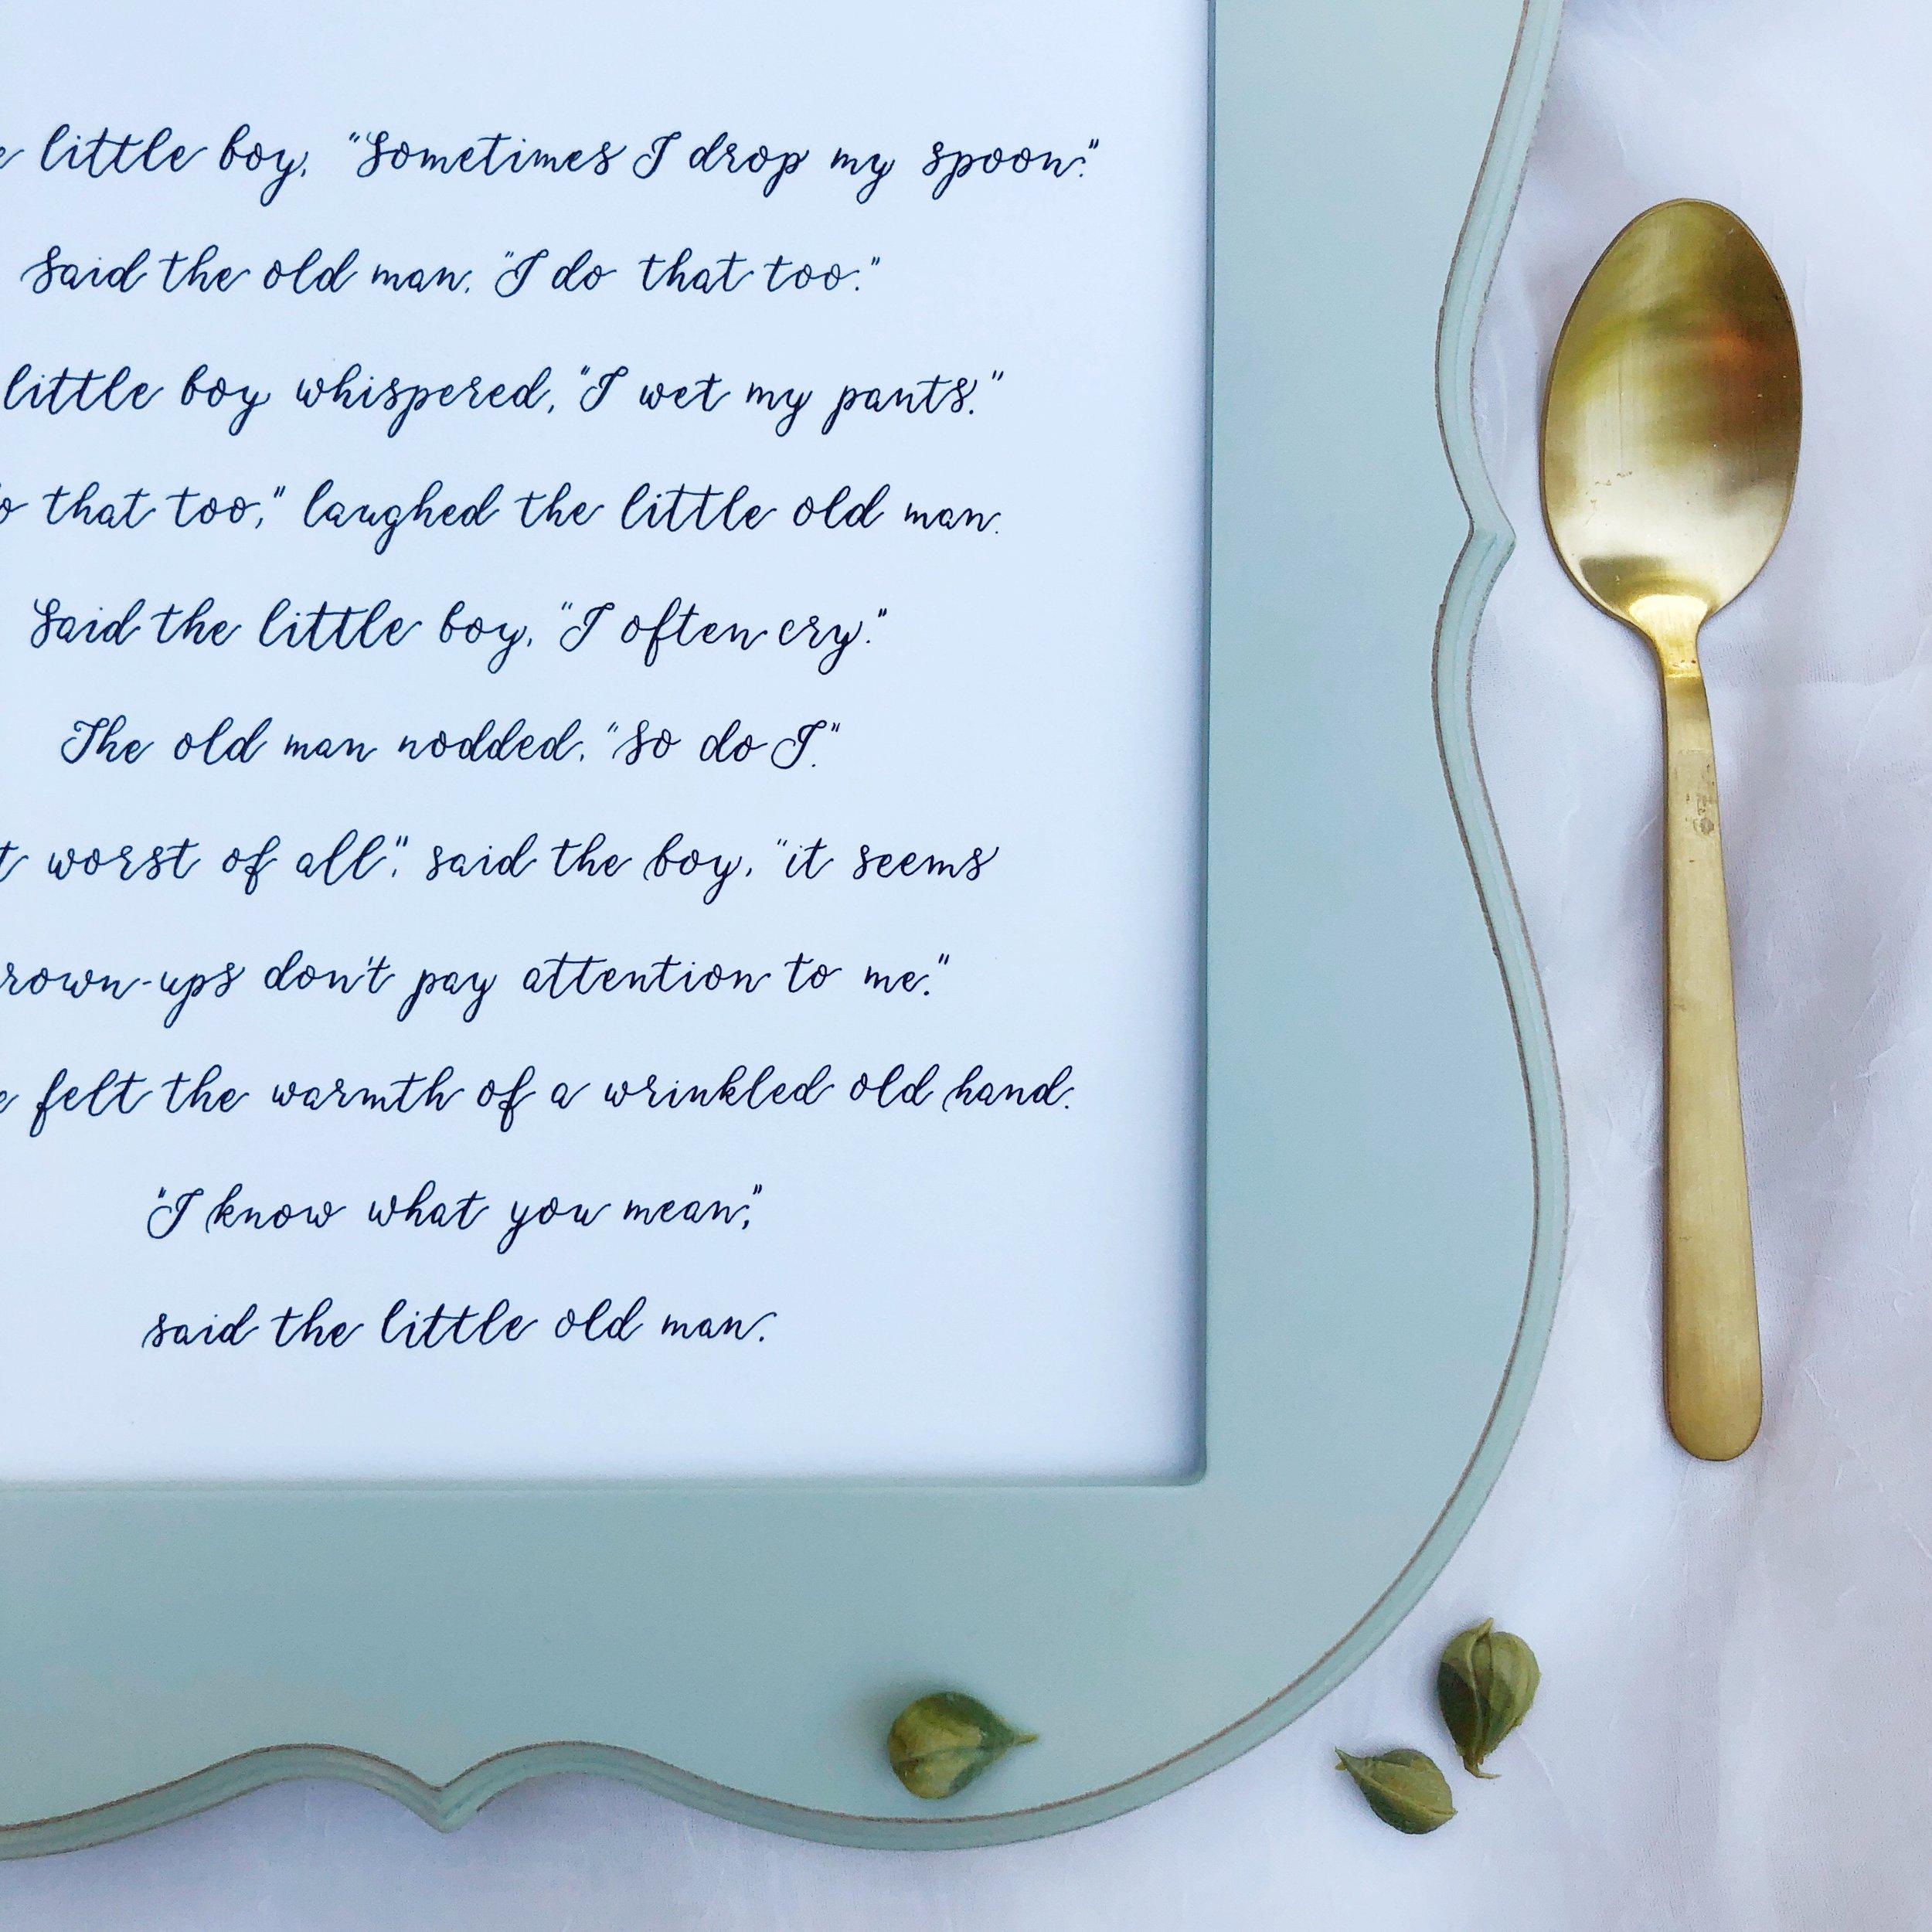 Central PA, York PA, JesSmith Designs, custom, wedding, invitations, bridal, announcements, save the date, baby, hanover, calligraphy, baltimore, wedding invitations, lancaster, gettysburg-05-24 11.50.54.jpg